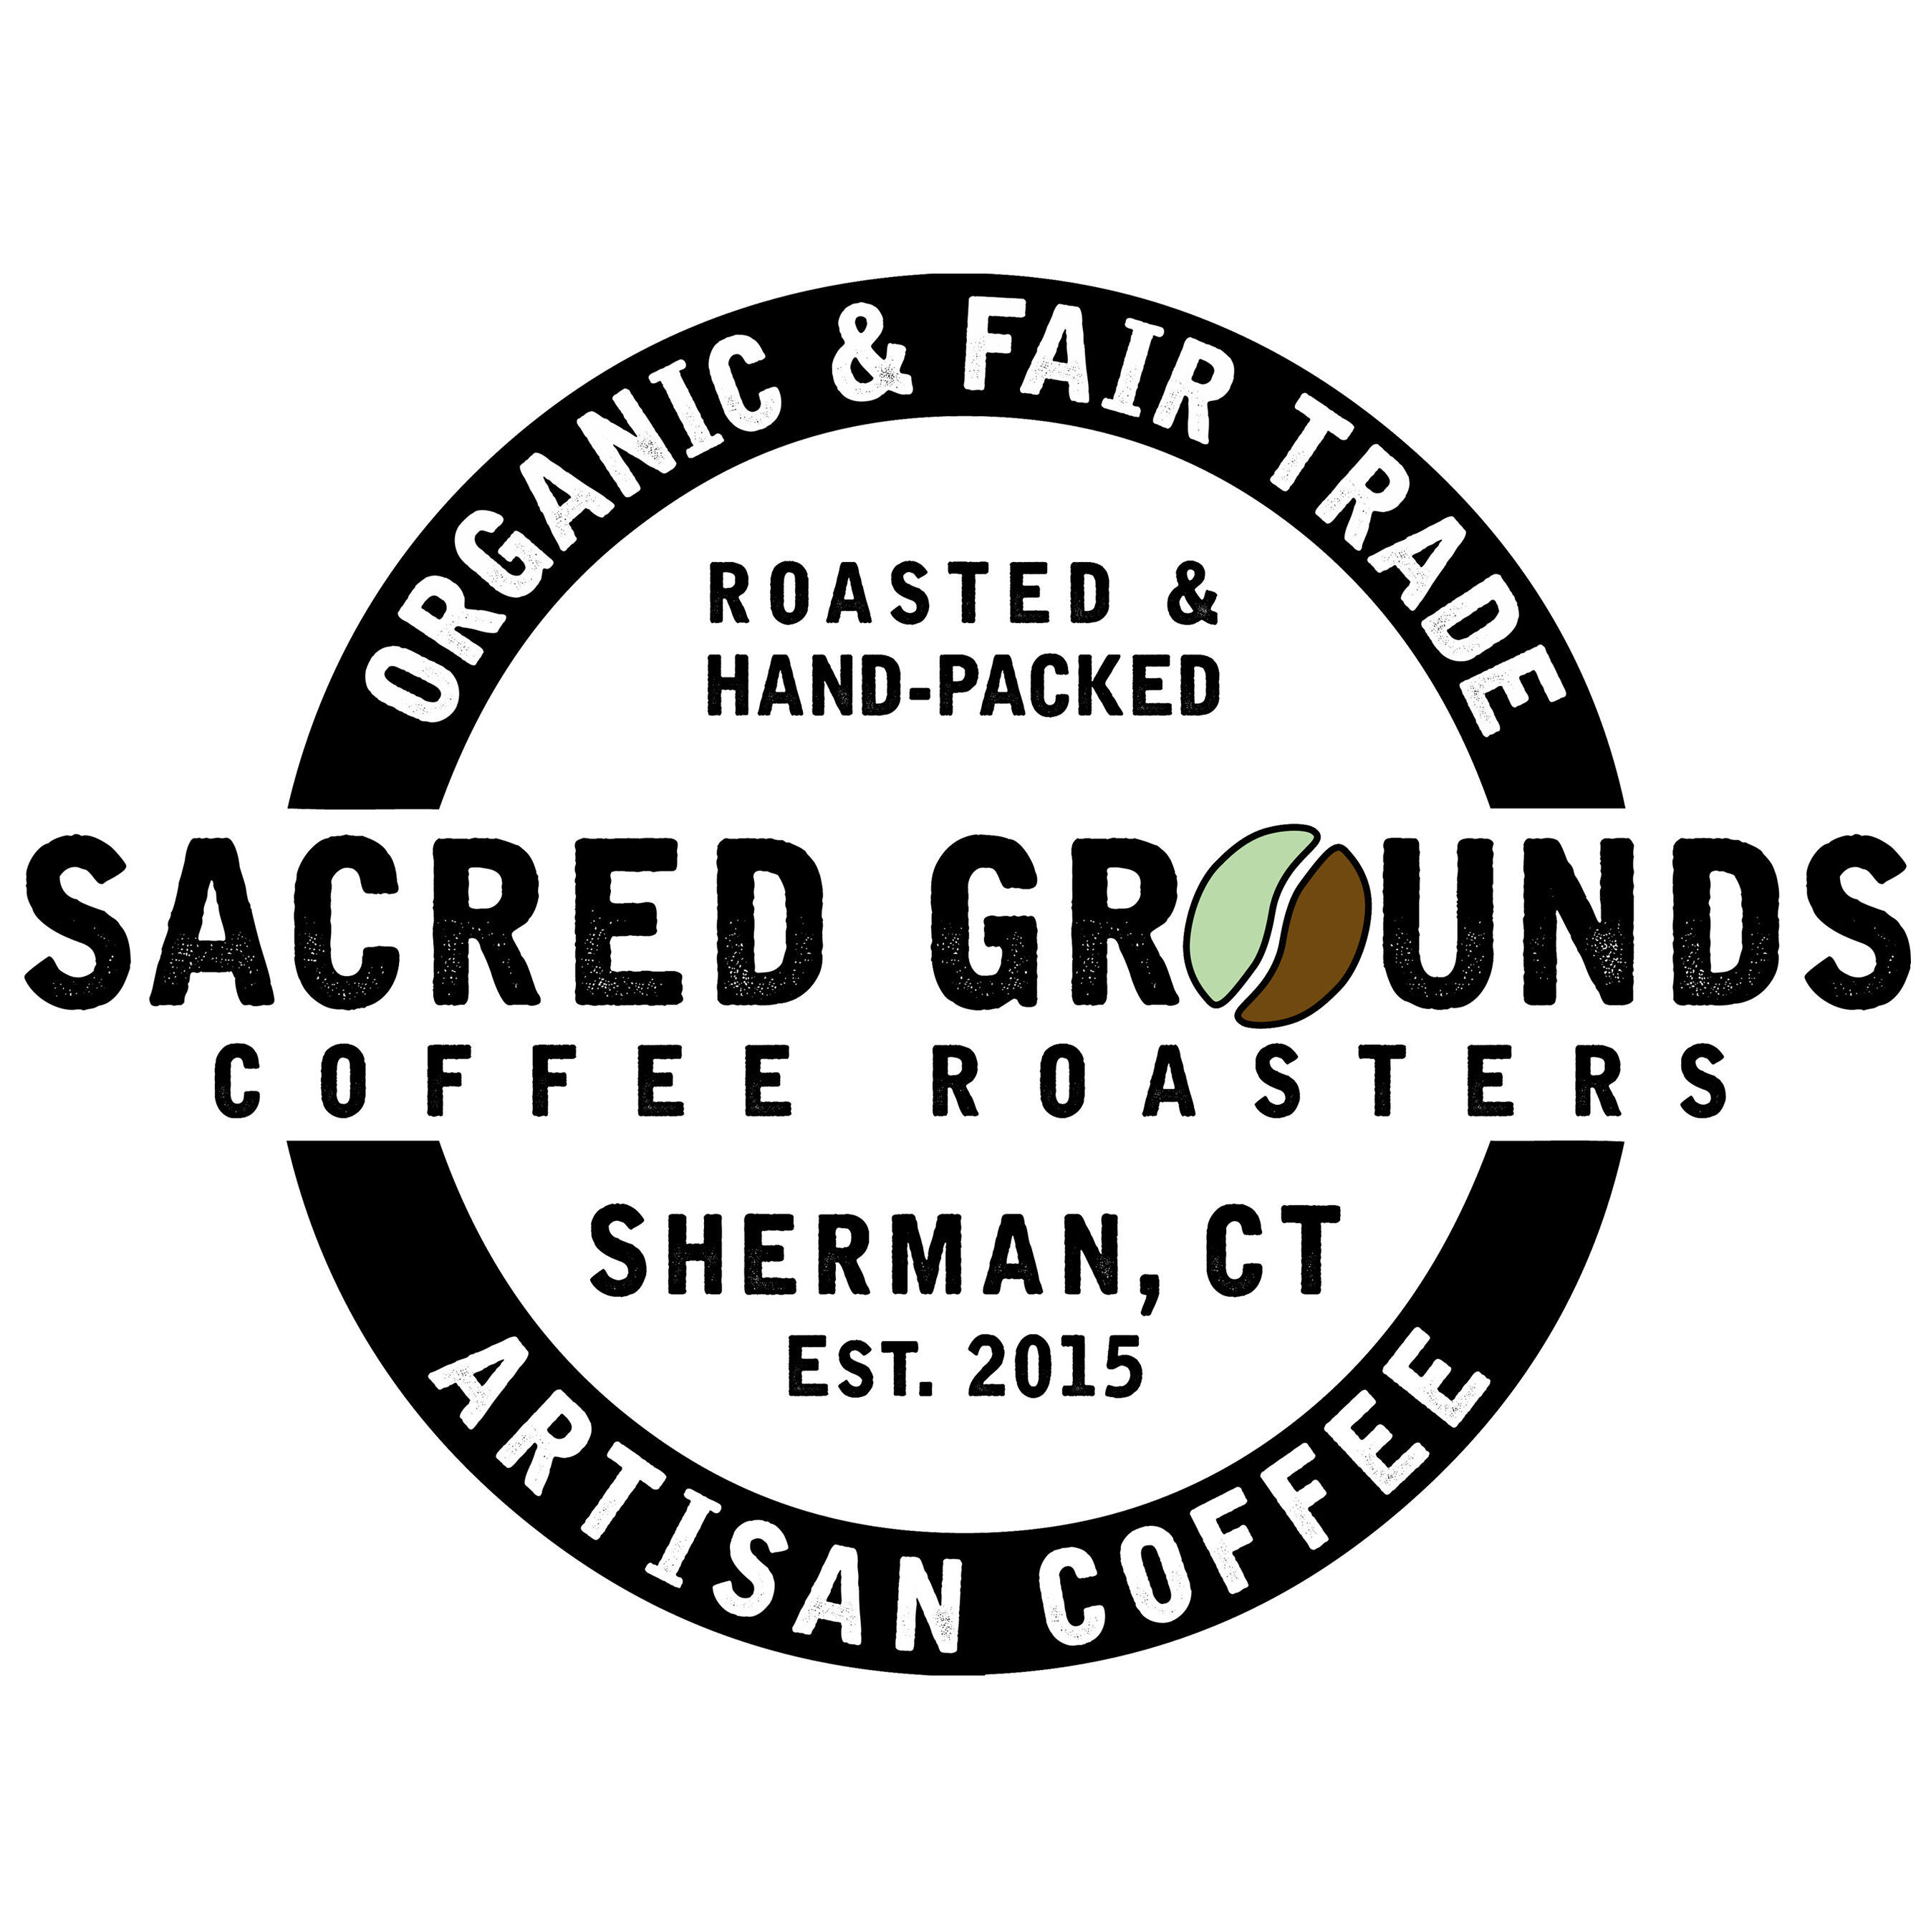 Sacred Grounds Coffee Roasters